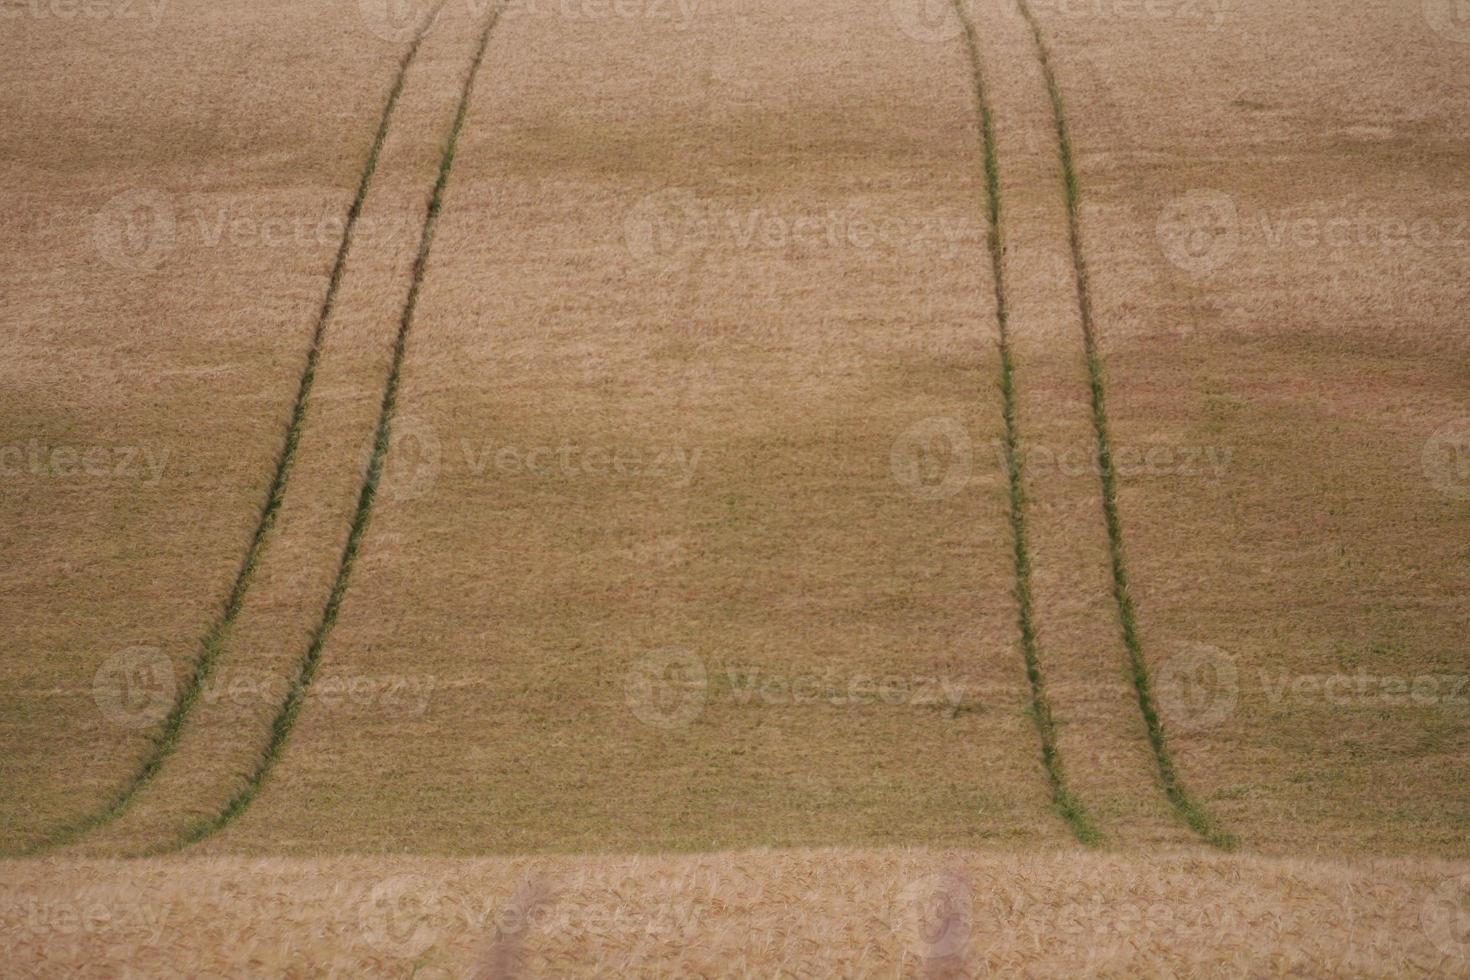 wheat field tracks photo